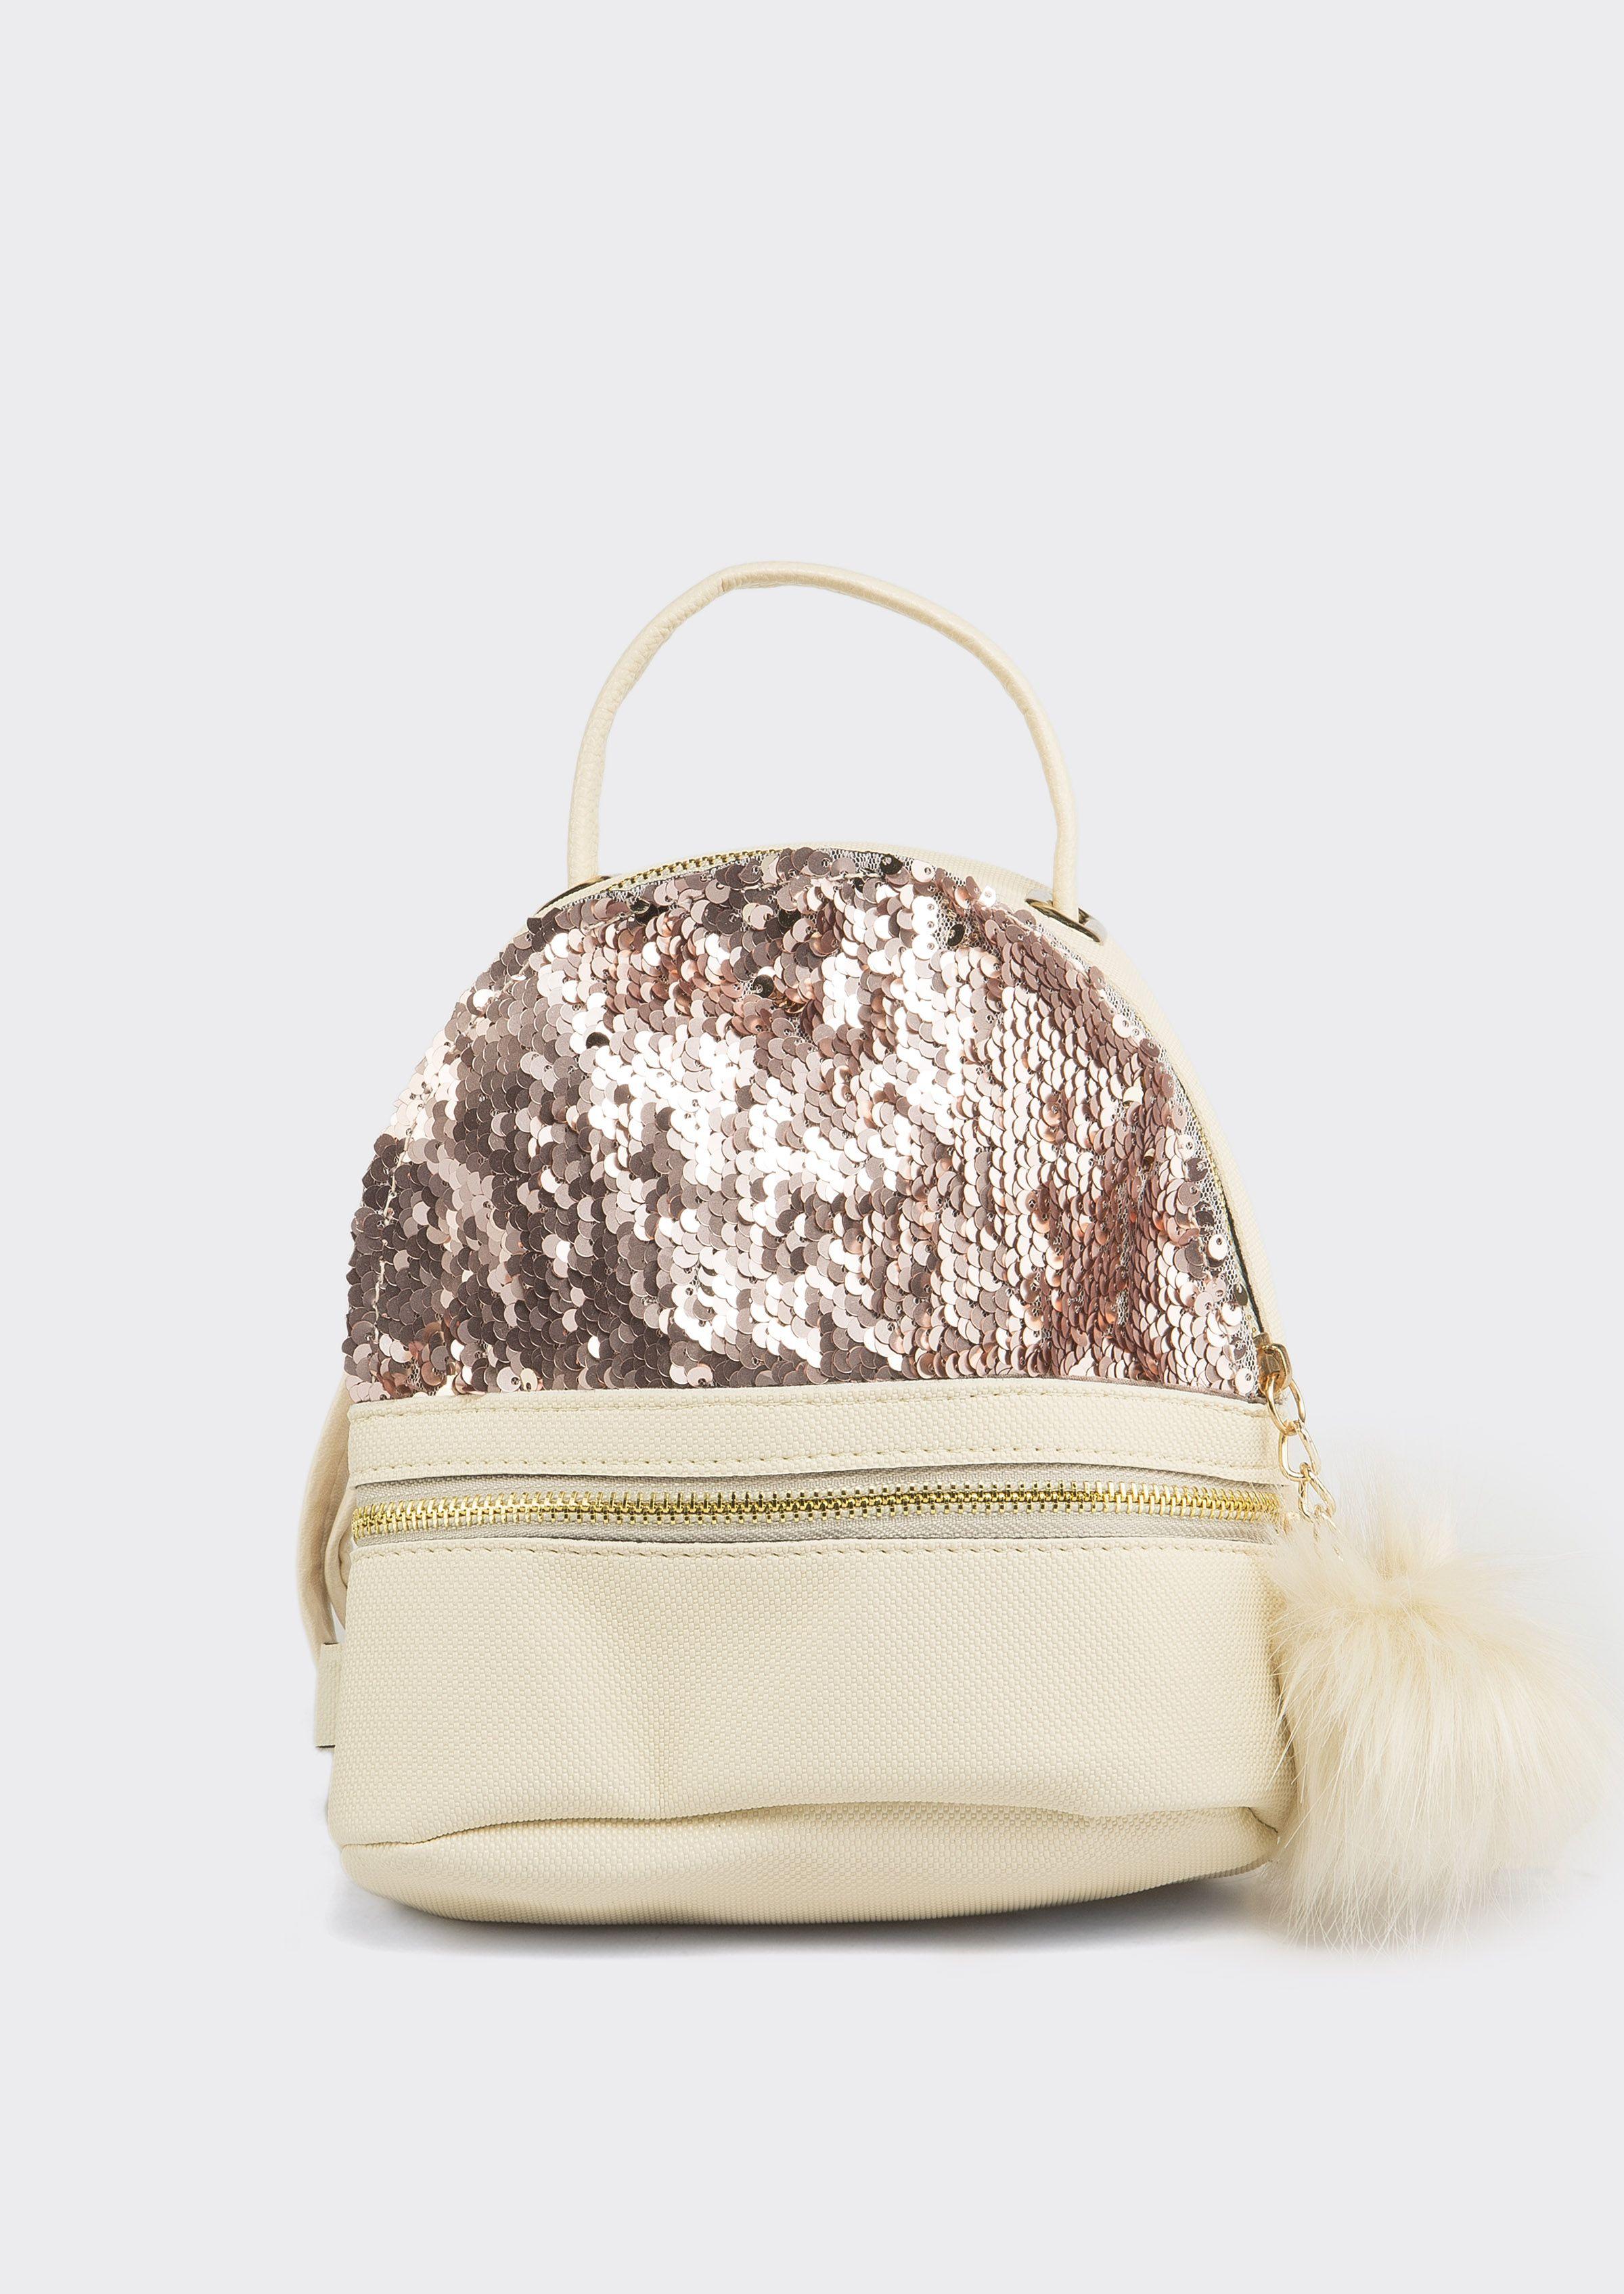 Bej Pullu Ponpon Aksesuarl Mini Srt Antas Bags Woman Nucelle Women Leather Purse Satchel Shoulder Bag Handbag Lock Gorgeous Glitter Elegant Blue School Your Style Clutches